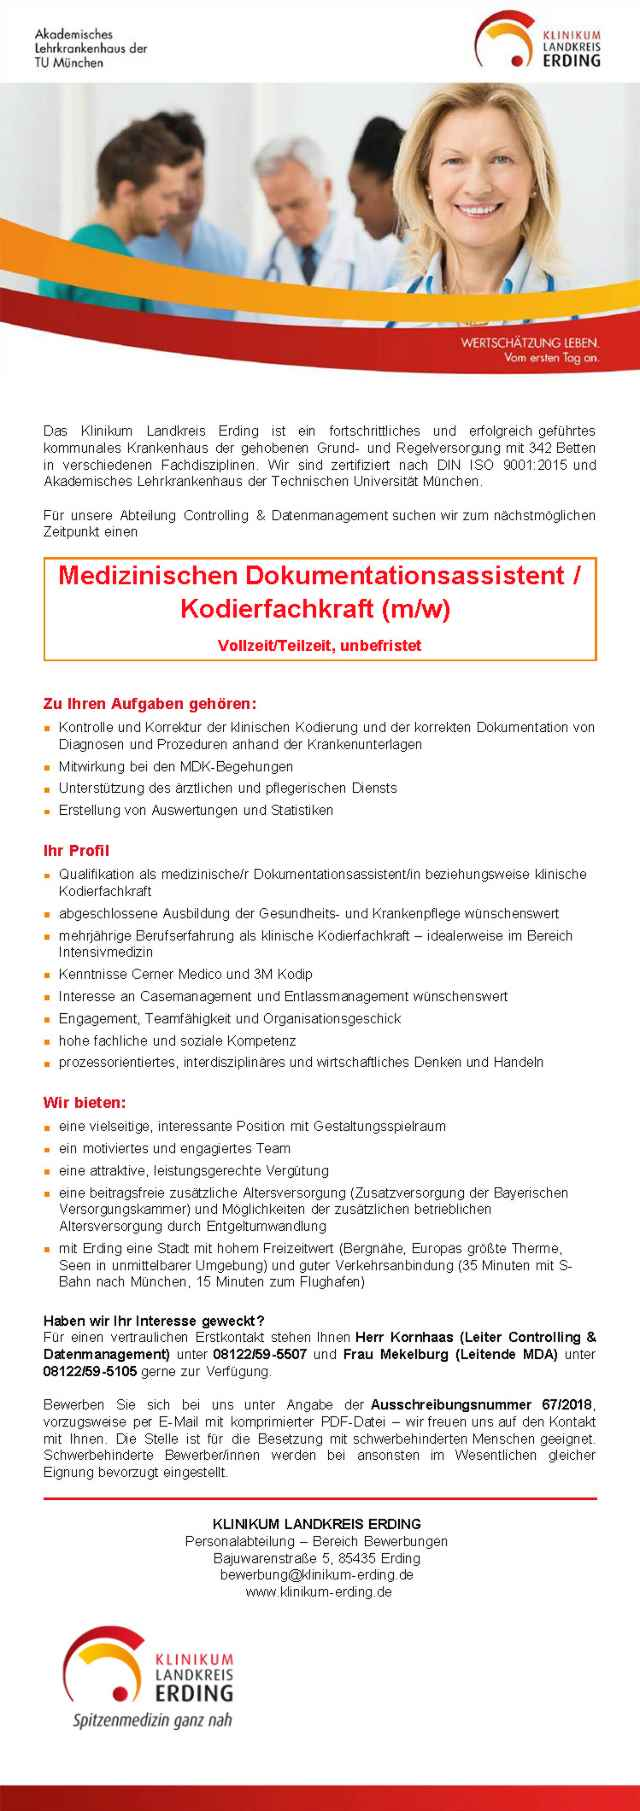 Das Klinikum Landkreis Erding: Med. Dokumentationsassistent / Kodierfachkraft (m/w)